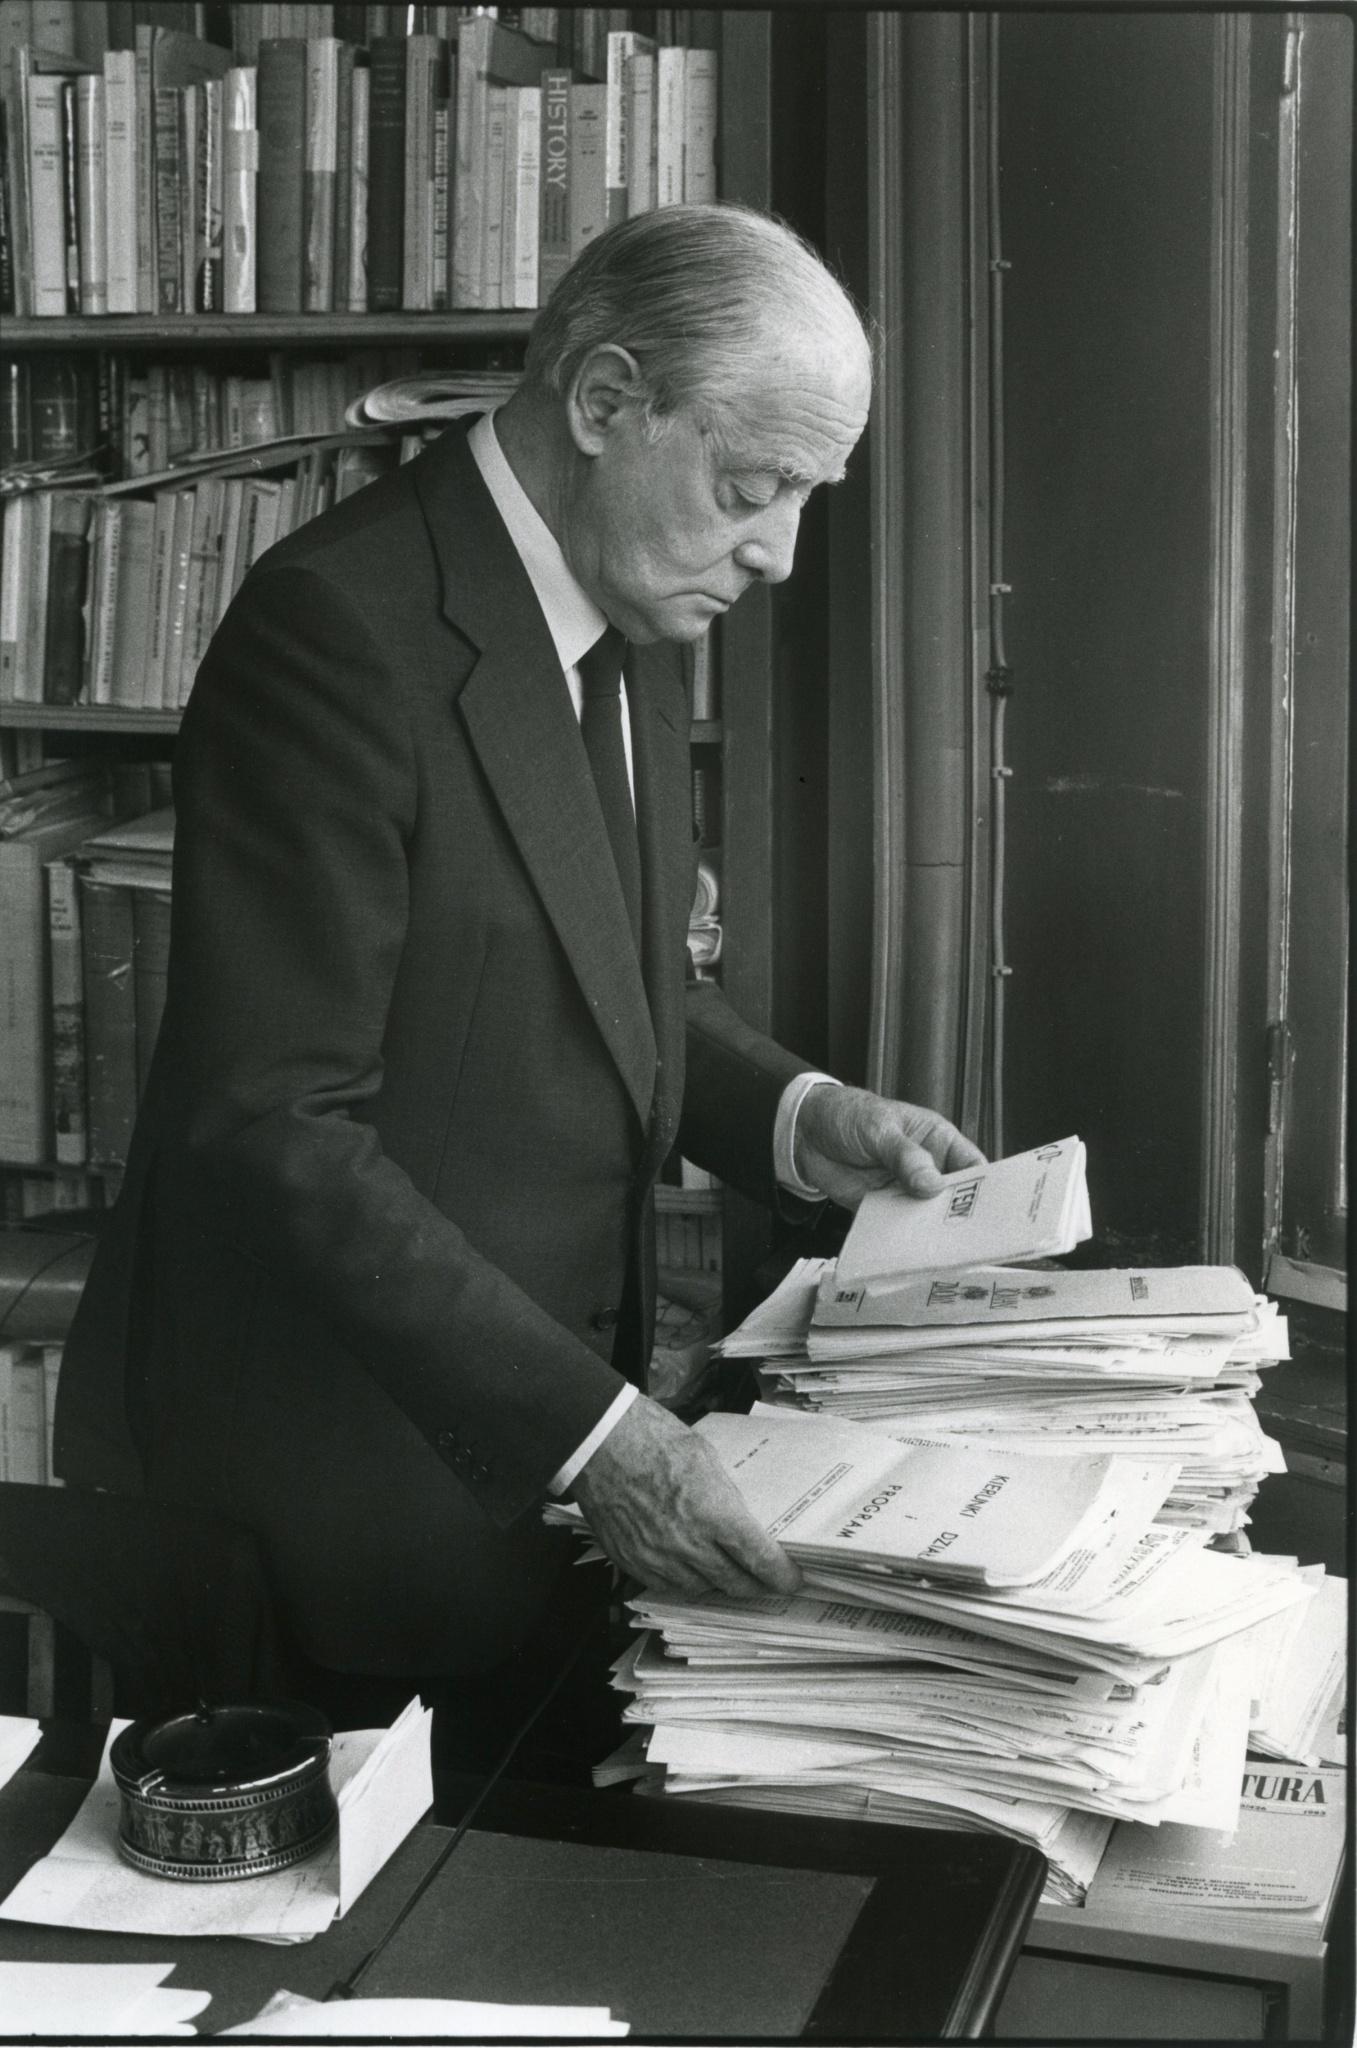 <div class='inner-box'><div class='close-desc'></div>  <span class='opis'>Jerzy Giedroyc podczas robienia korekty. Maisons-Laffitte, 1986.</span>  <div class='clearfix'></div><div class='clearfix'></div><span class='autor'>fot. Bolesław Edelhajt</span>  </div>